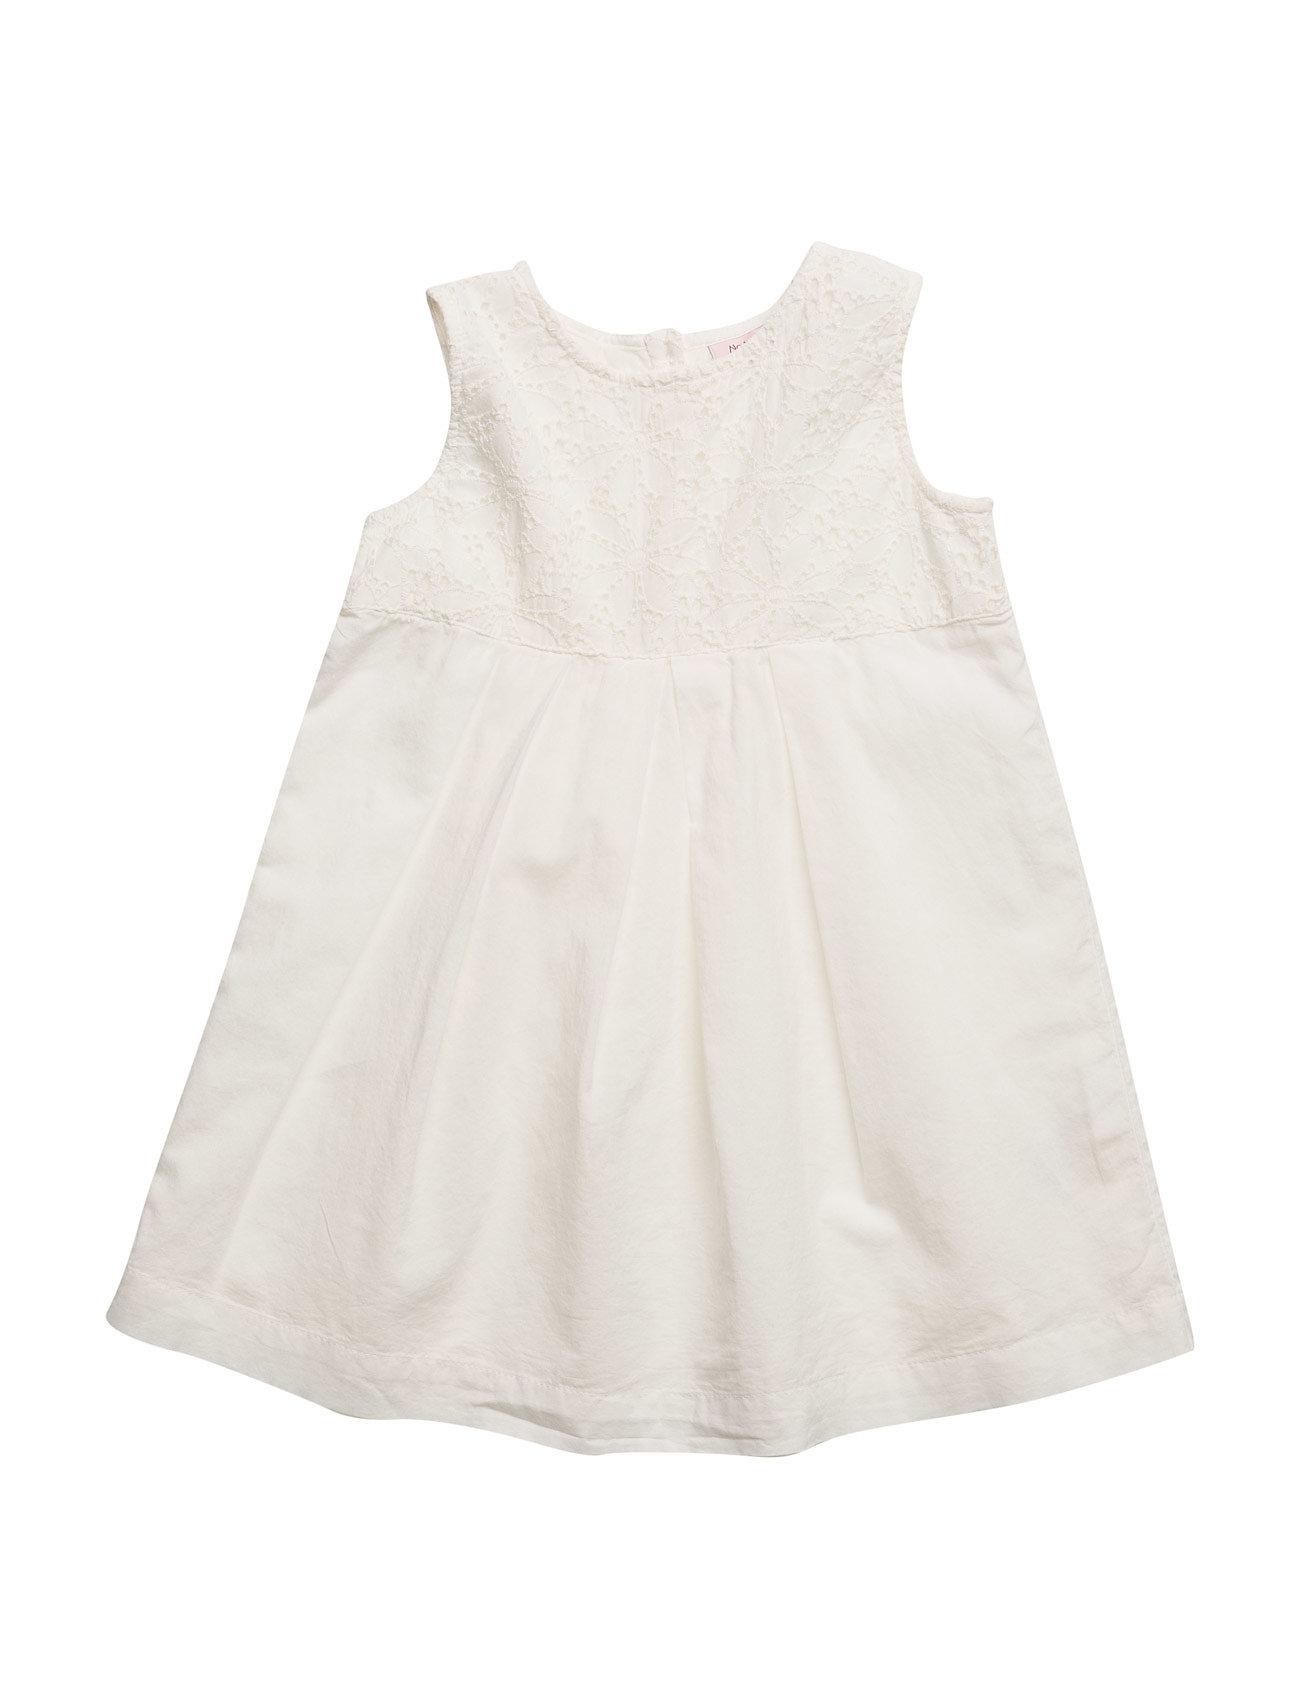 Dress Sleeveless Noa Noa Miniature Klänningar